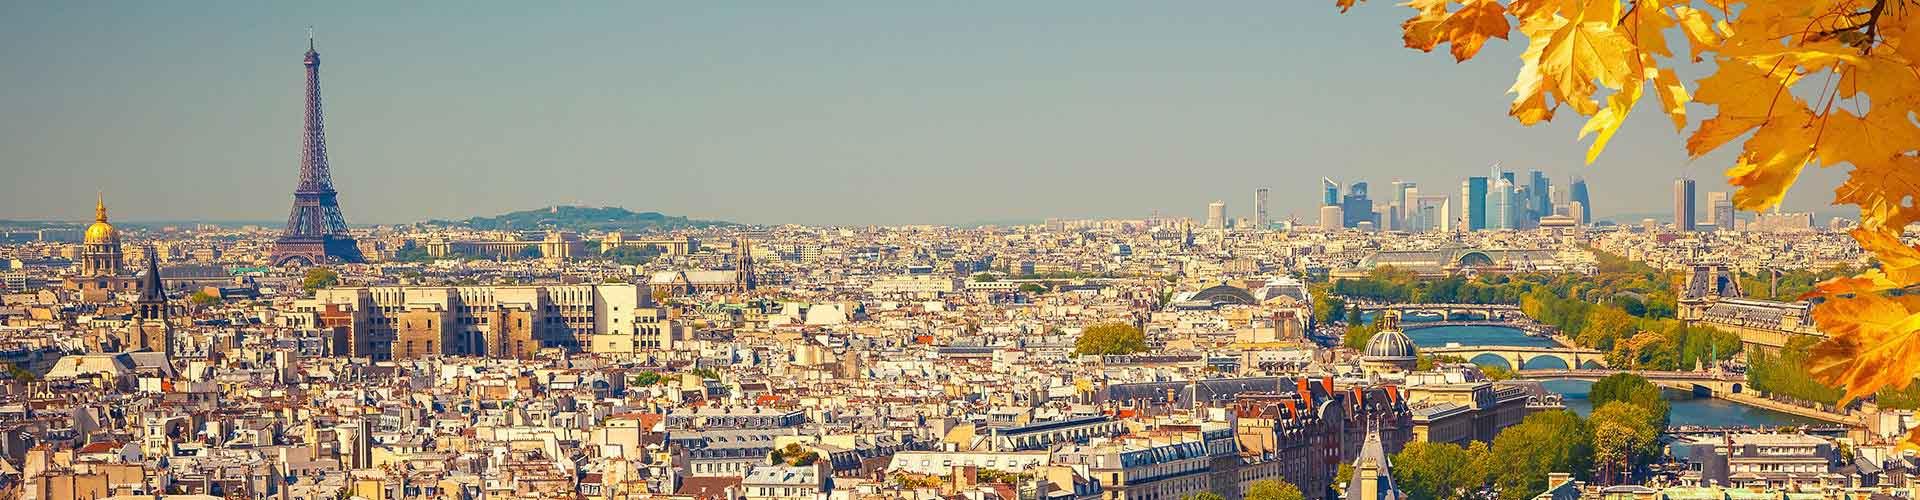 París - Albergues Juveniles cerca a Grande Arche. Mapas de París, Fotos y Comentarios para cada Albergue Juvenil en París.